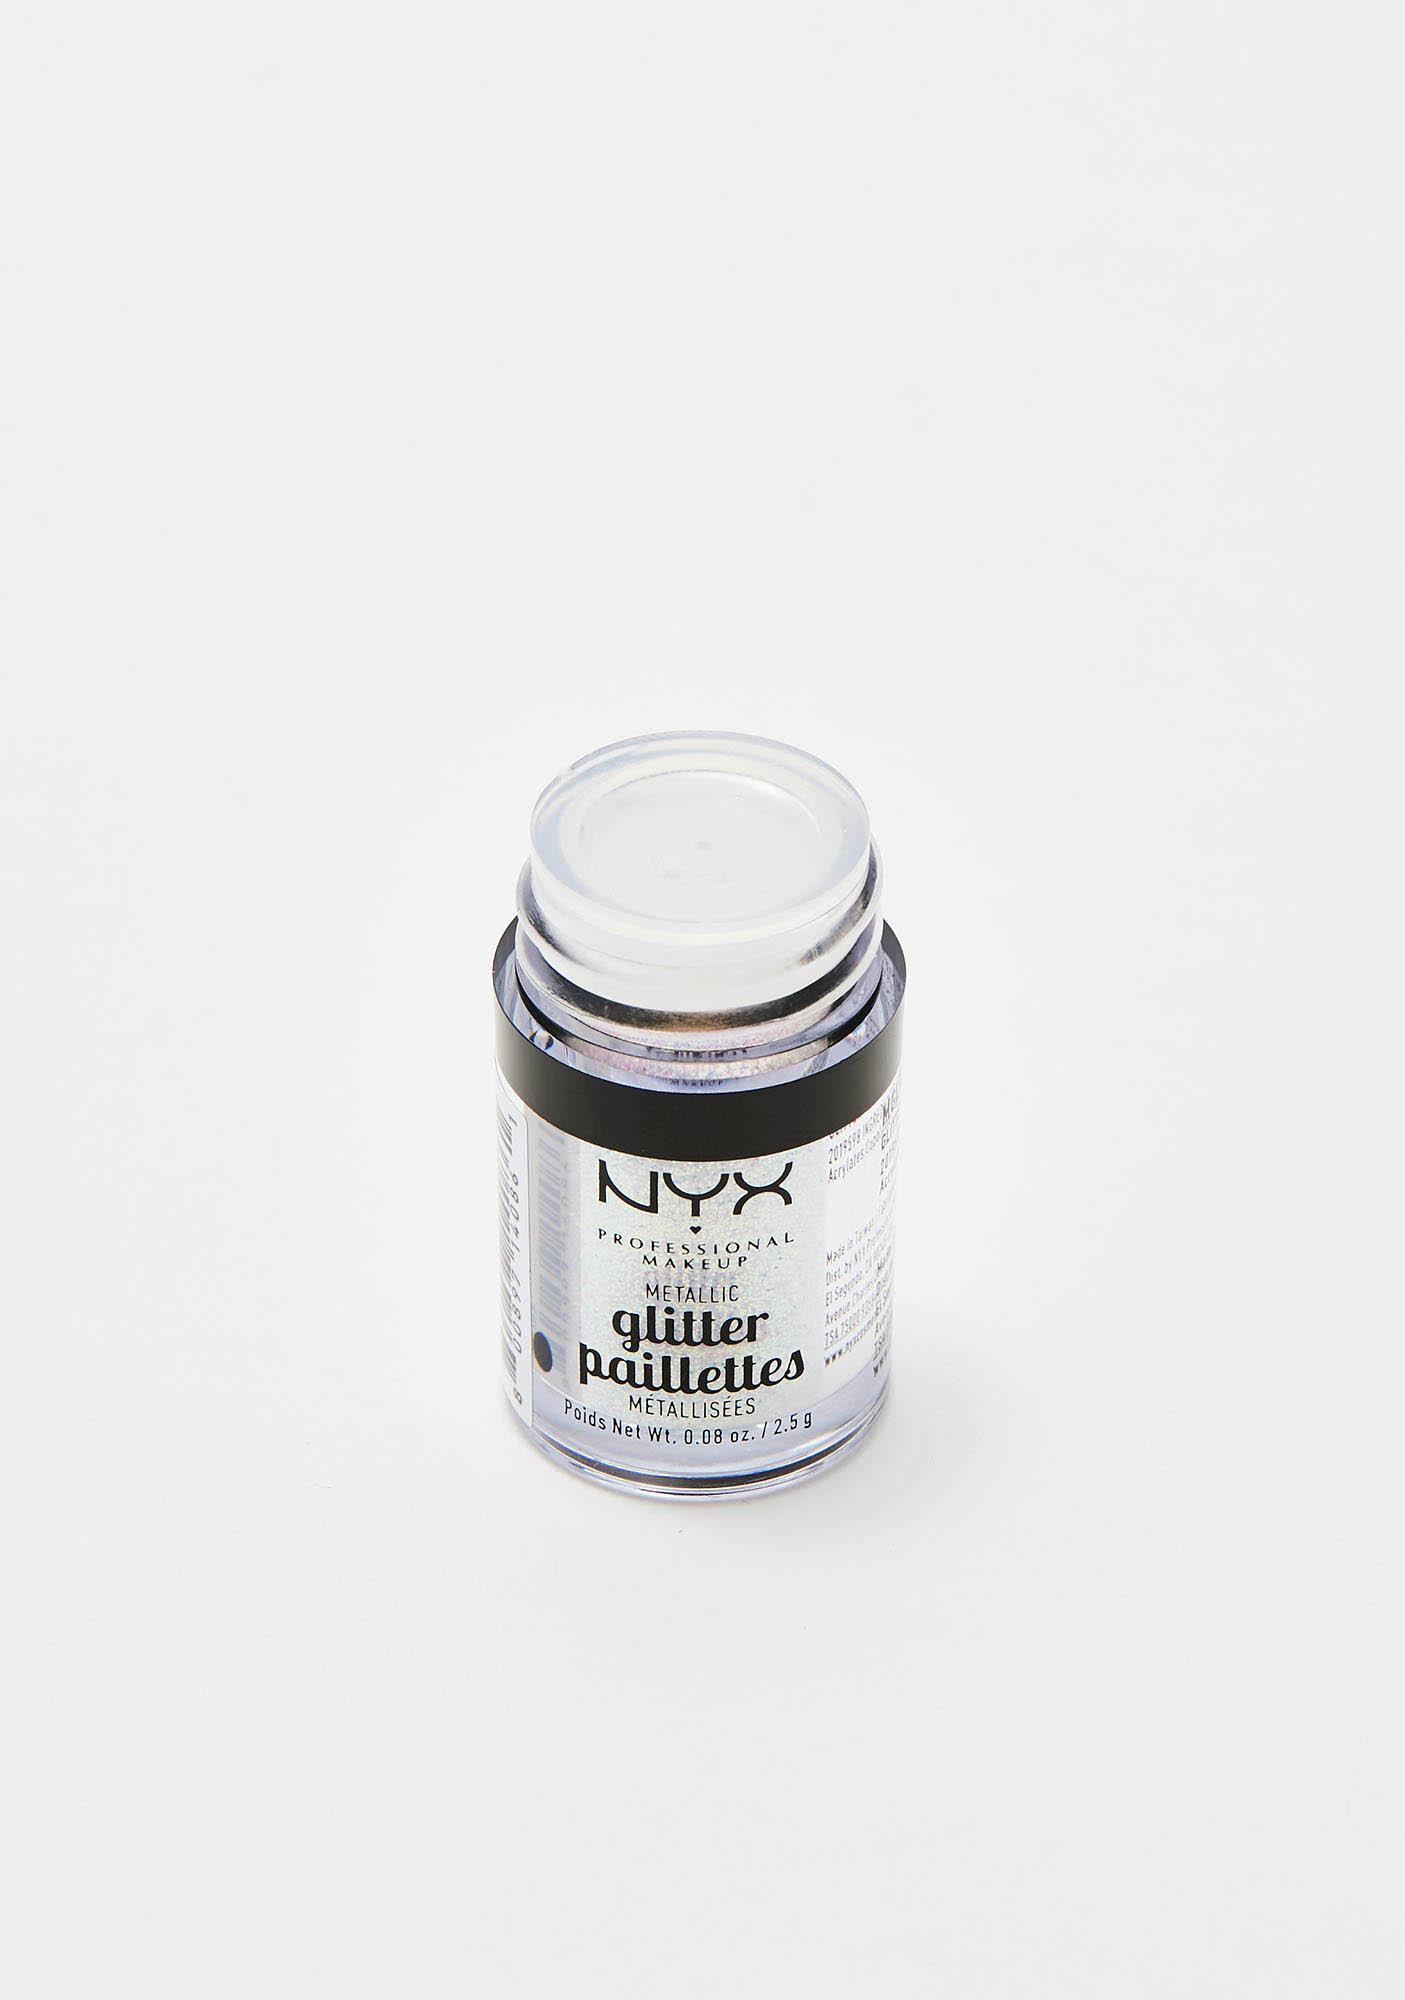 NYX Professional Makeup Lumi-Lite Metallic Glitter